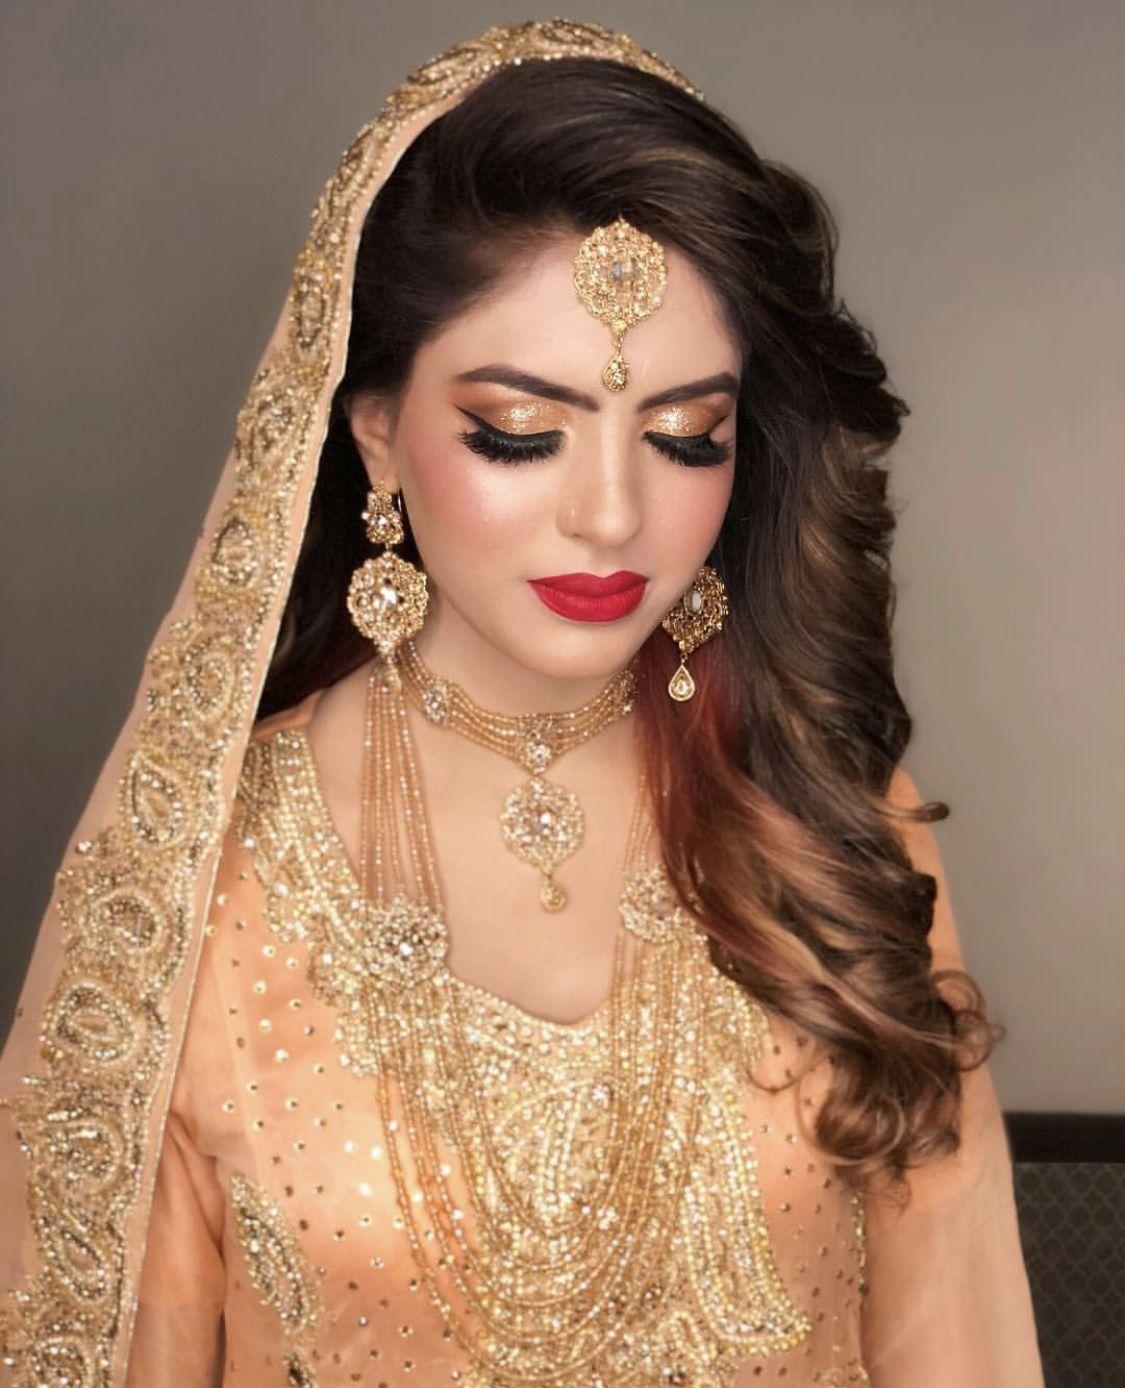 Pinterest Shikachand Indian Bride Beautiful Lhengas Bridal